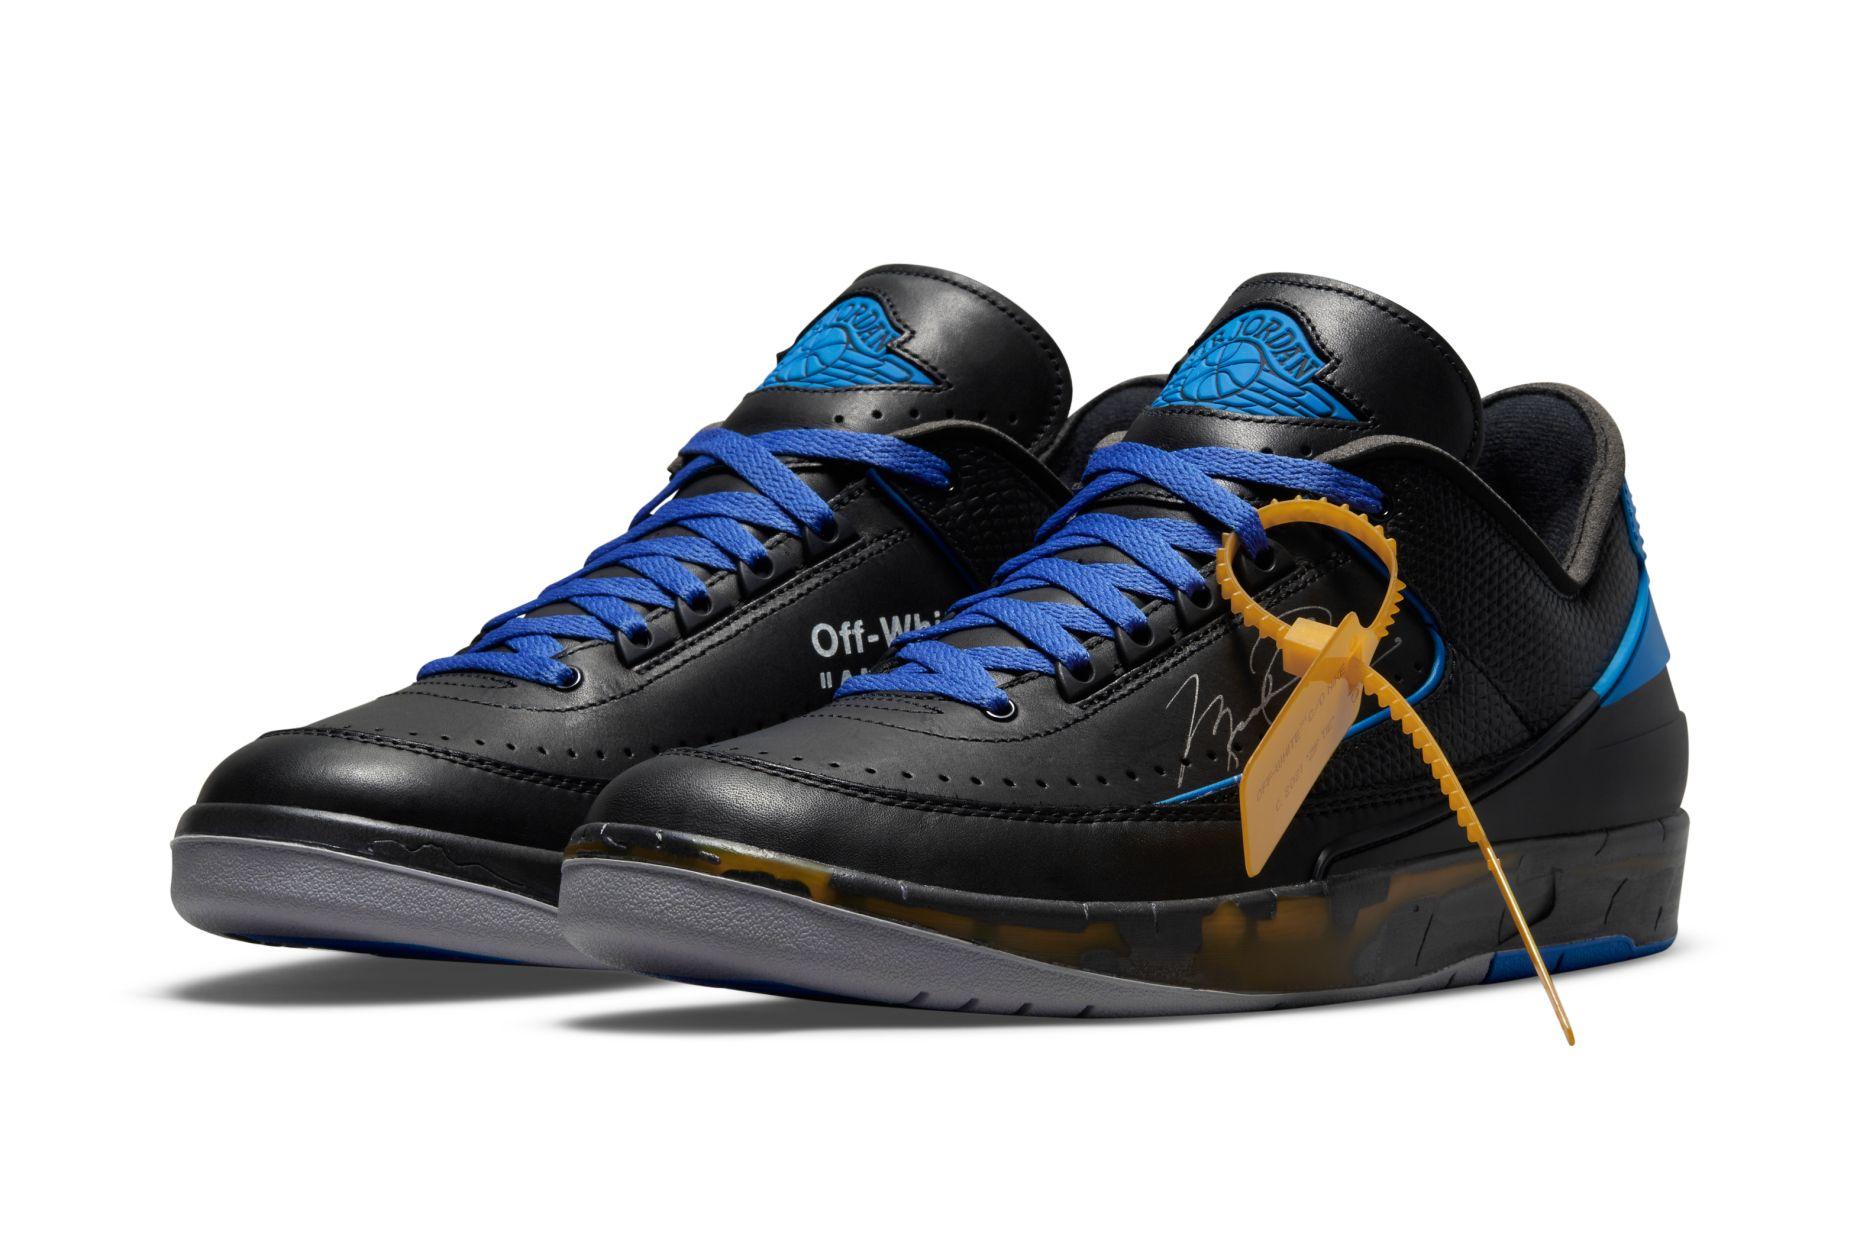 Off-White x Air Jordan 2 Low Black/Blue